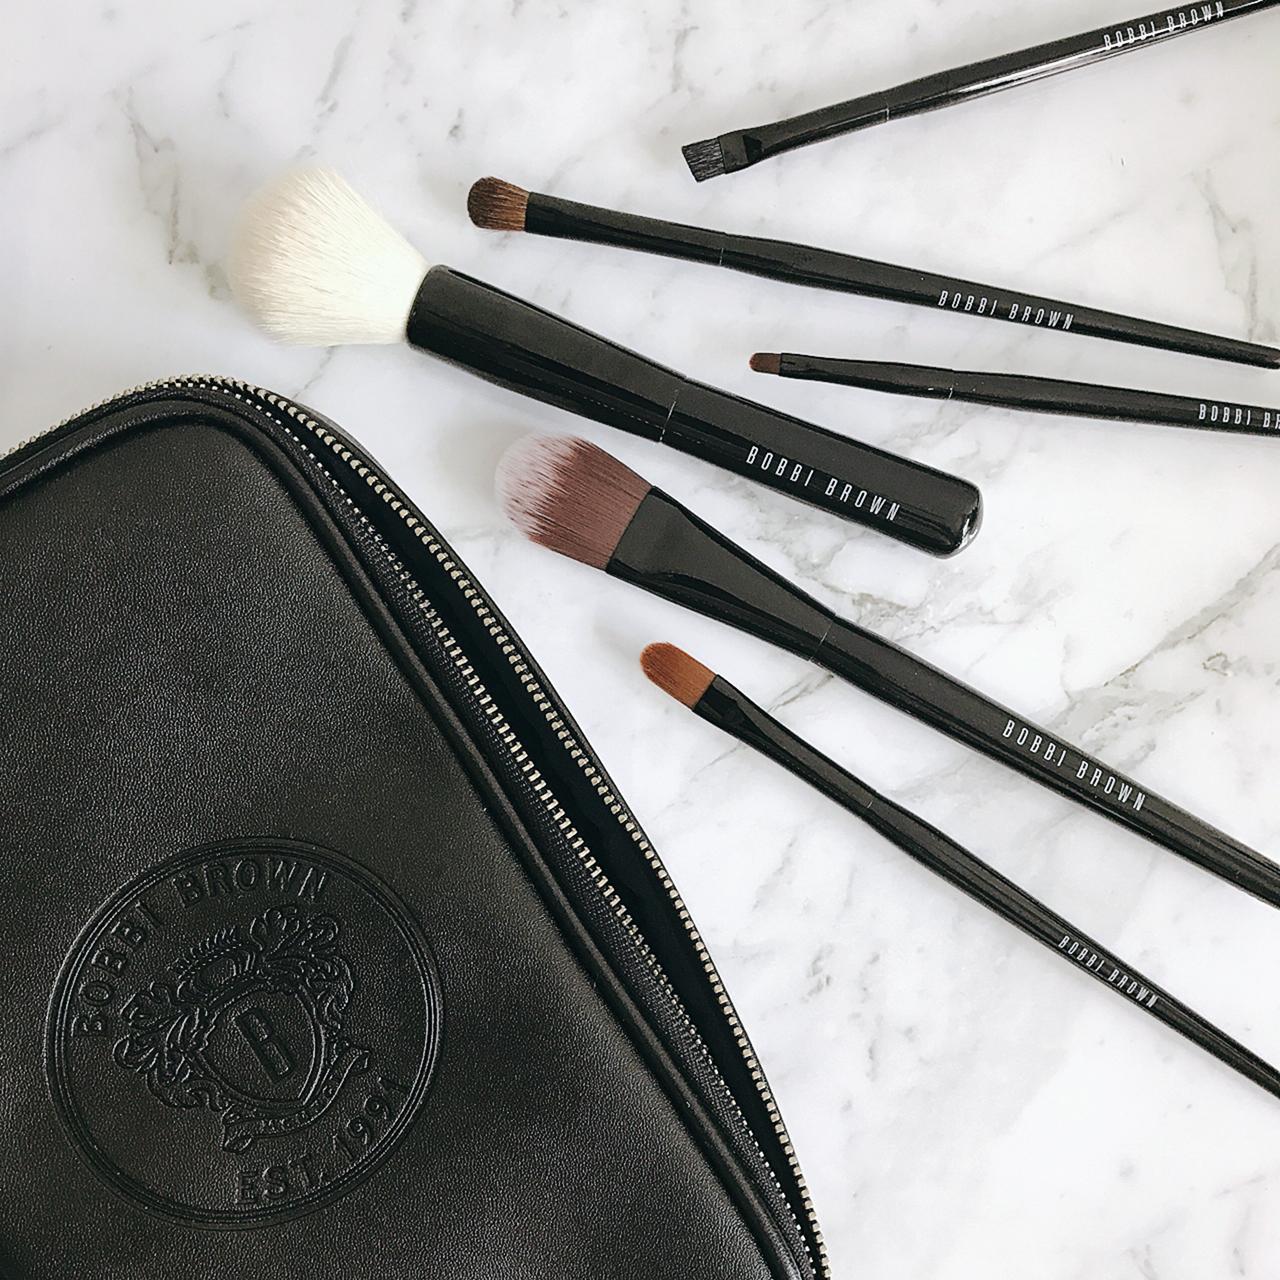 Bobbi Brown travel makeup brush set